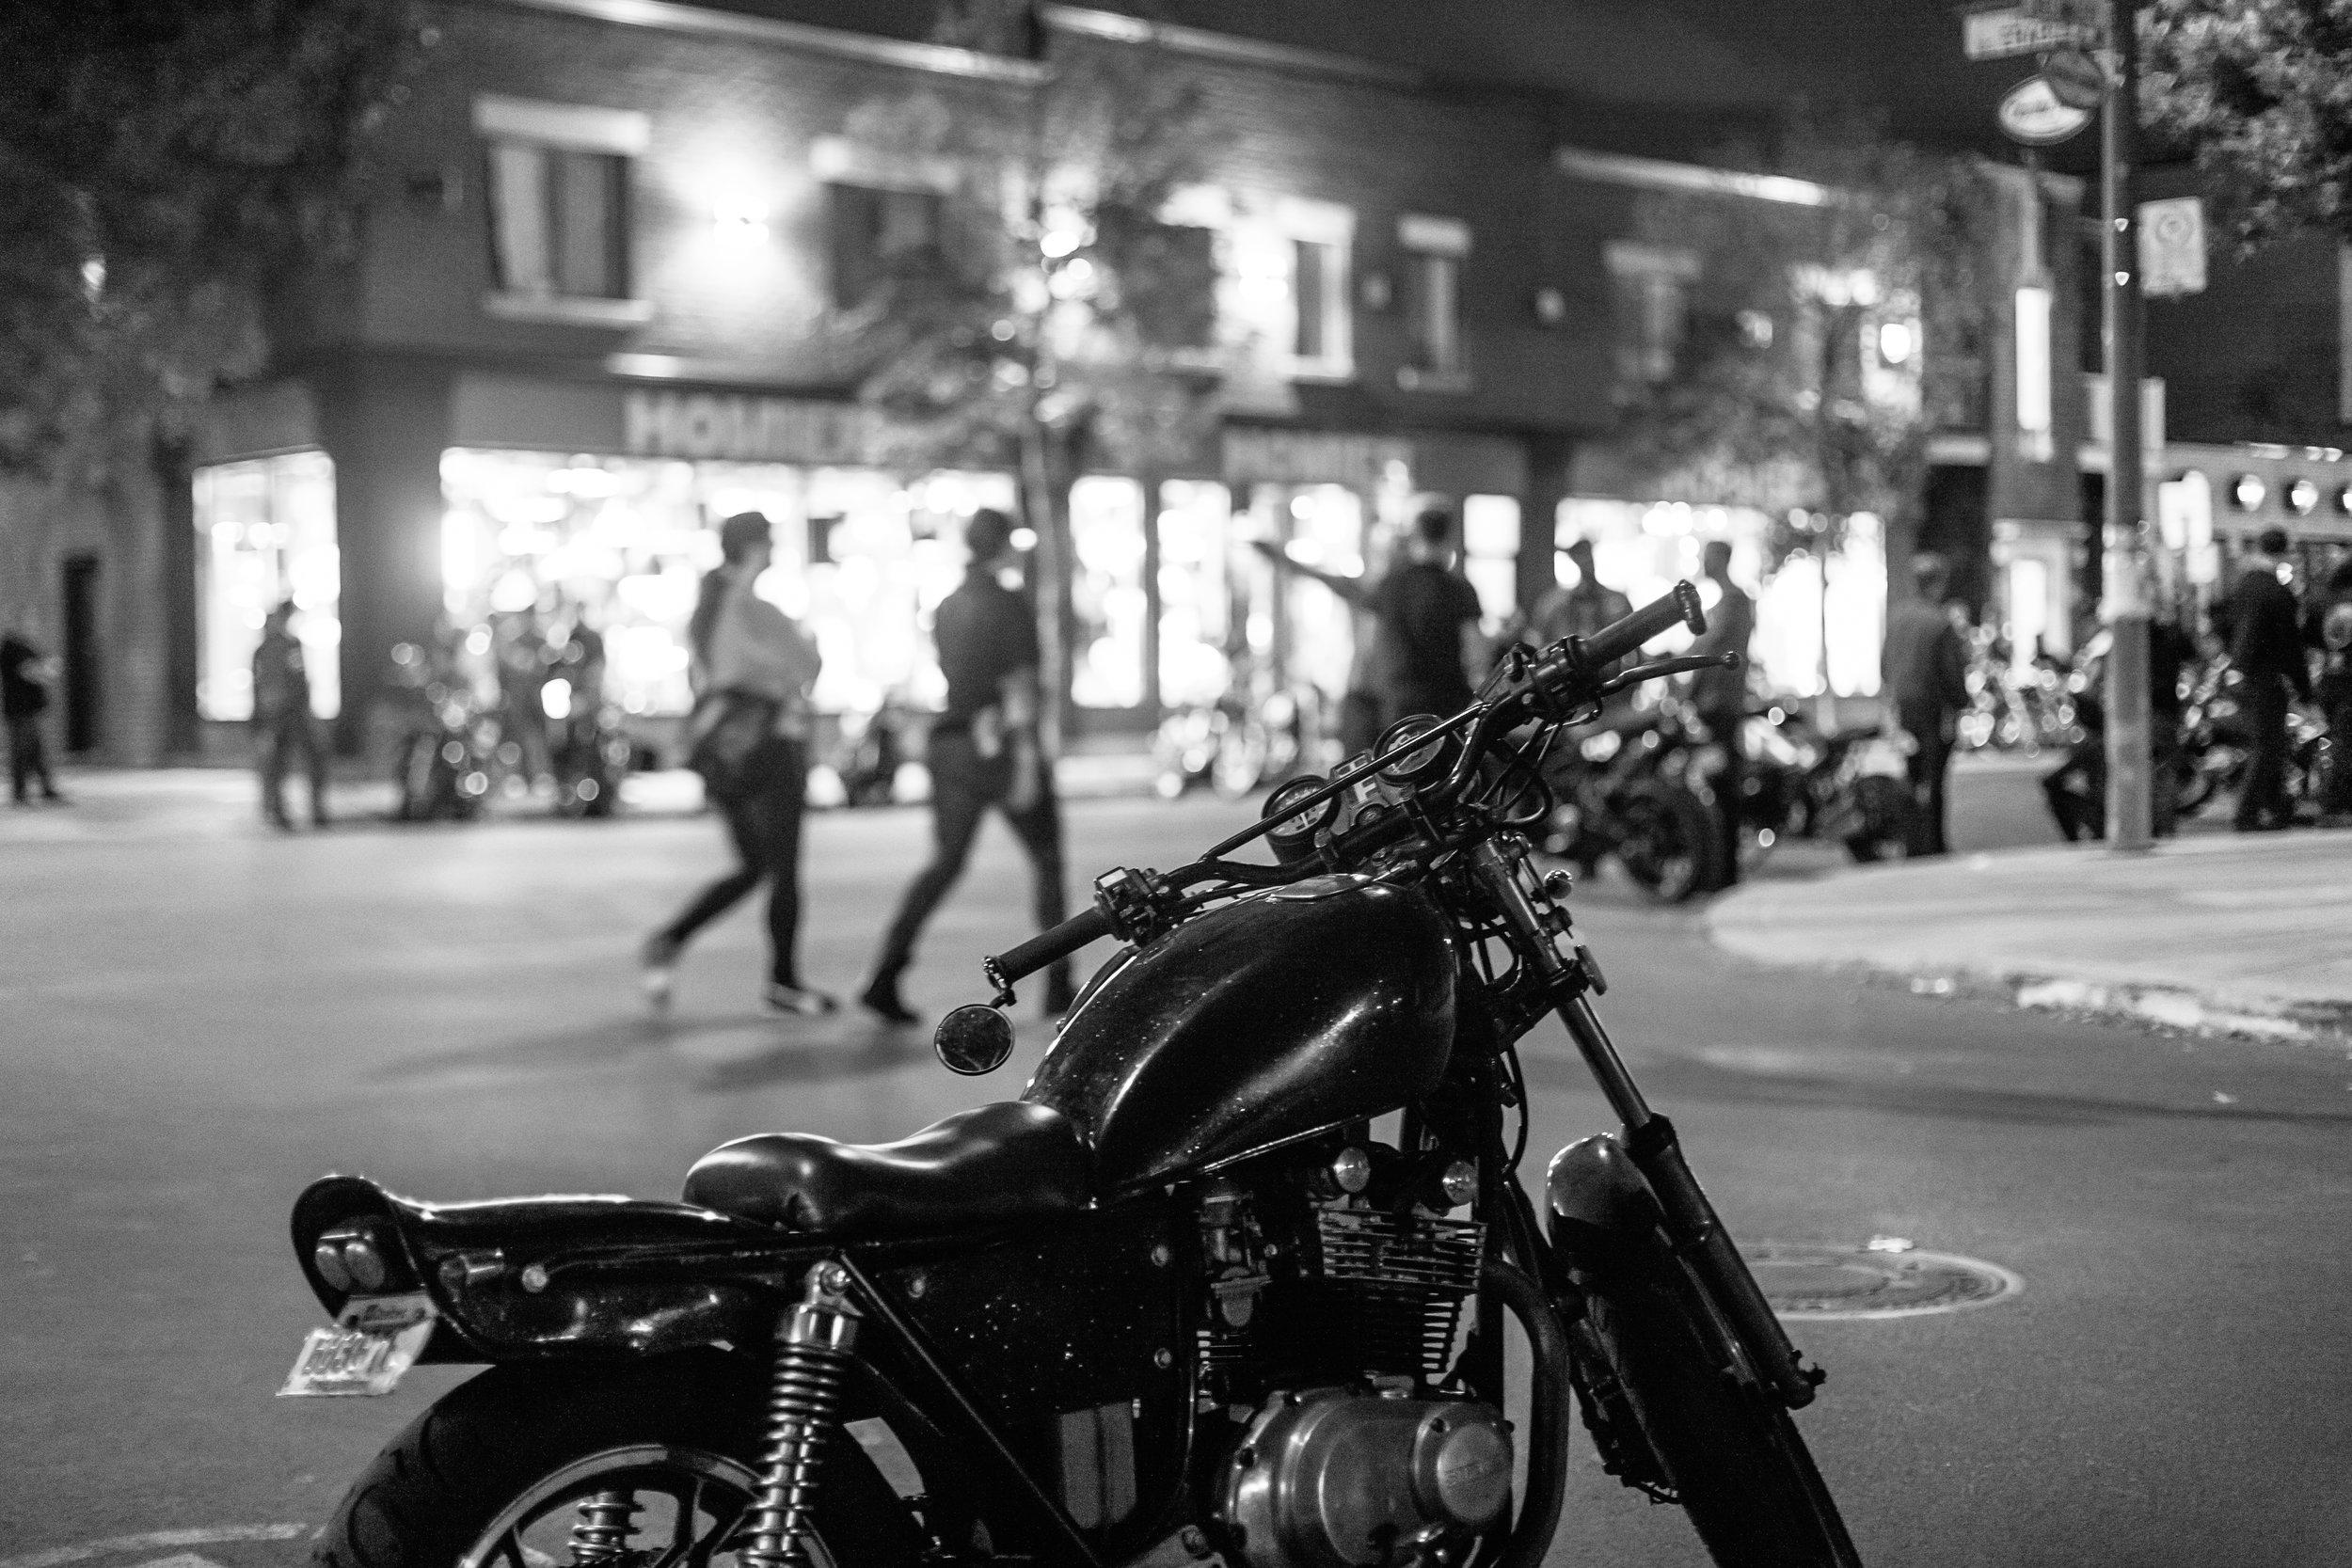 ViktorRadics_#TheMotoSocialMONTREAL_Aug_31_2016_IMG_8310.jpg